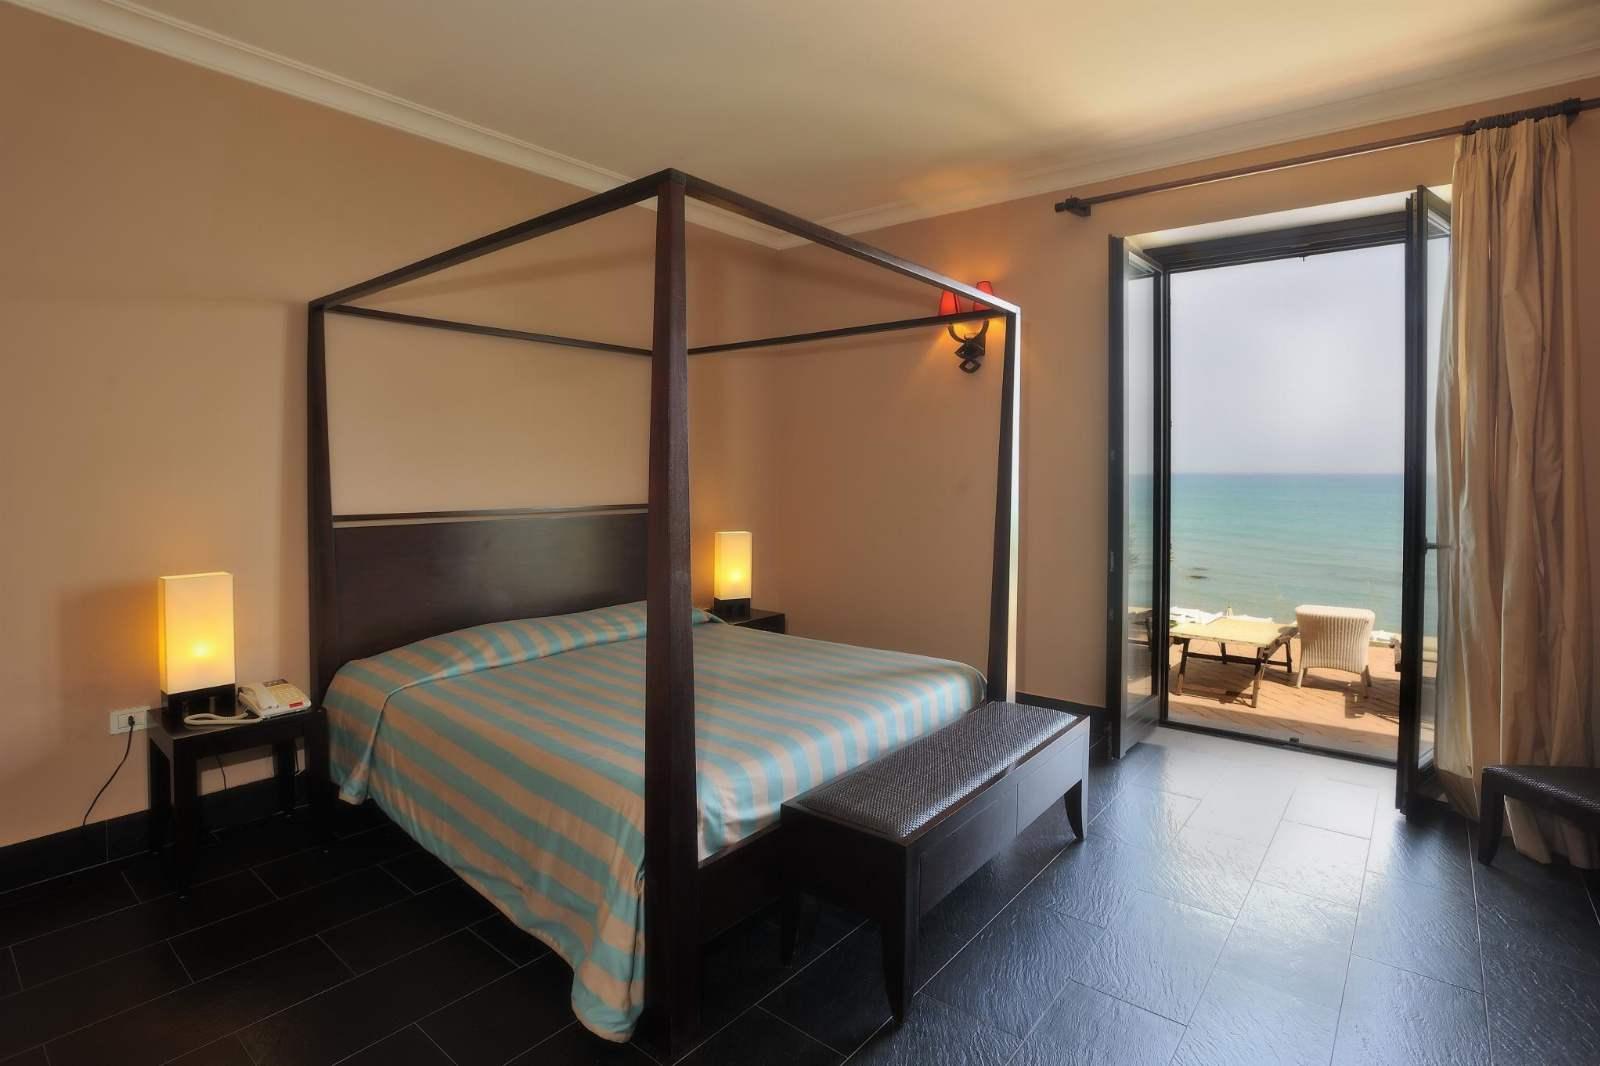 Falconara Resort & Spa: room / property / locale photo. Image 4